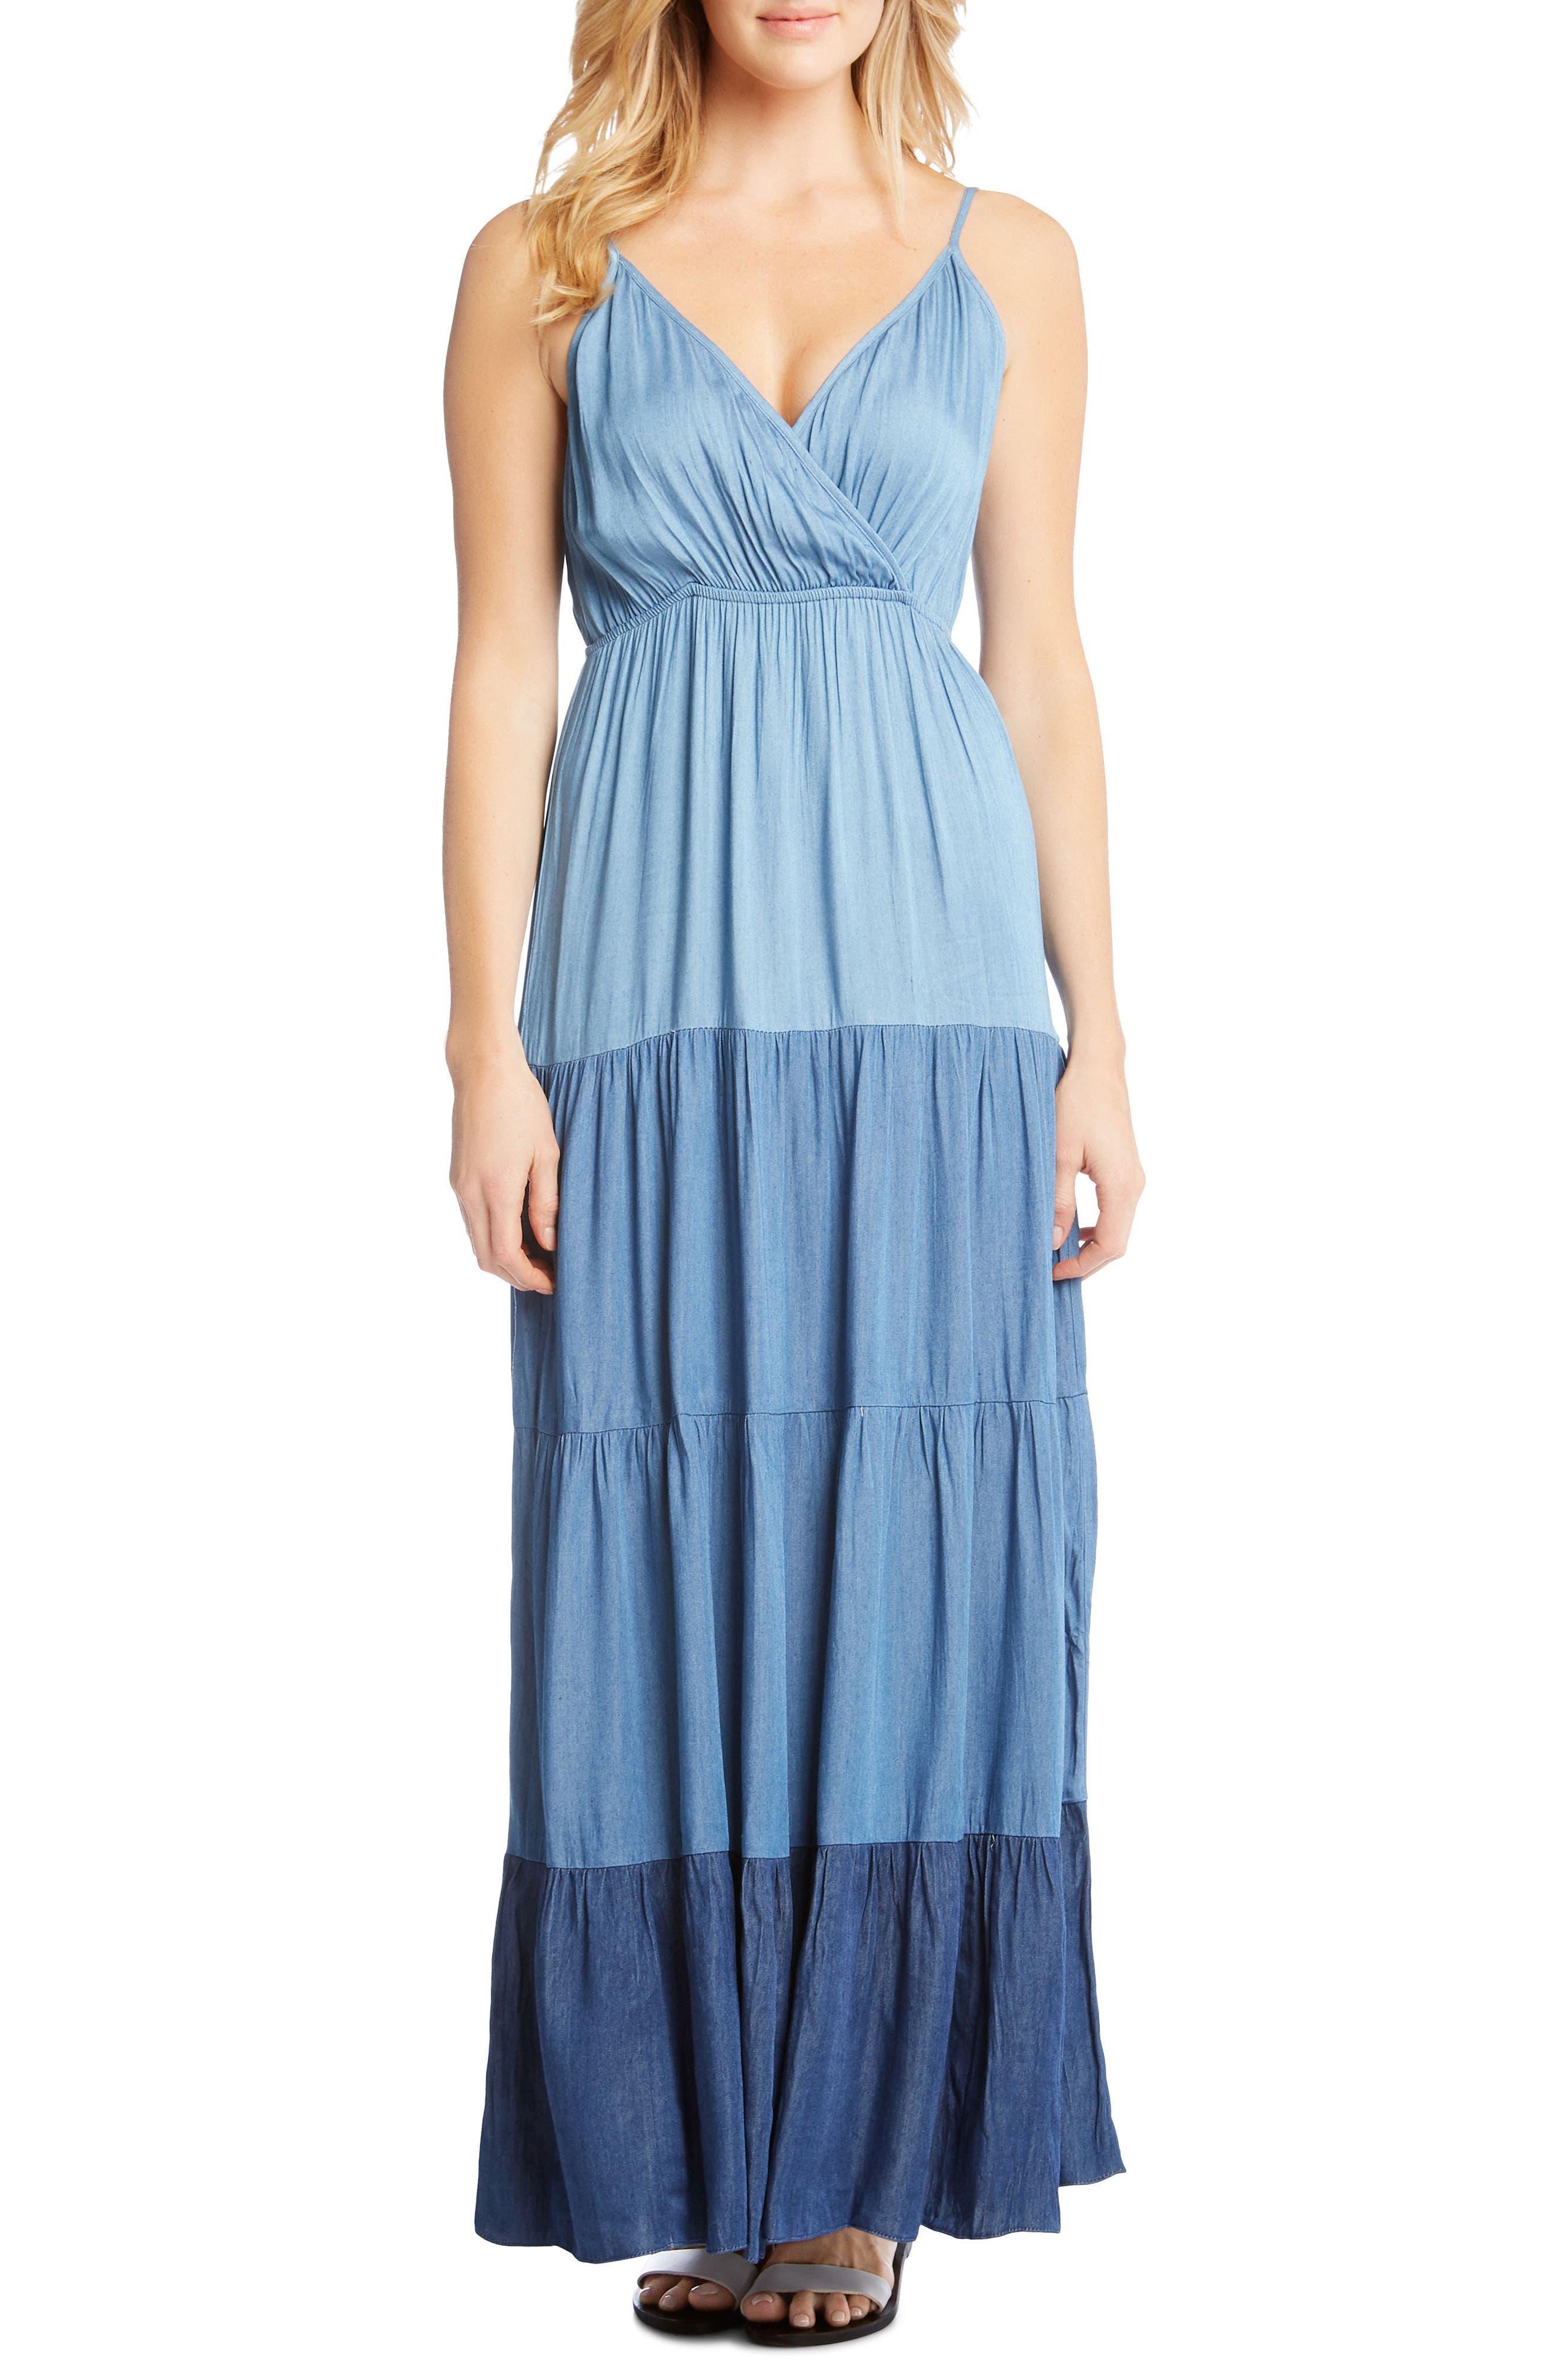 Tiered Chambray Maxi Dress,                             Main thumbnail 1, color,                             Multi